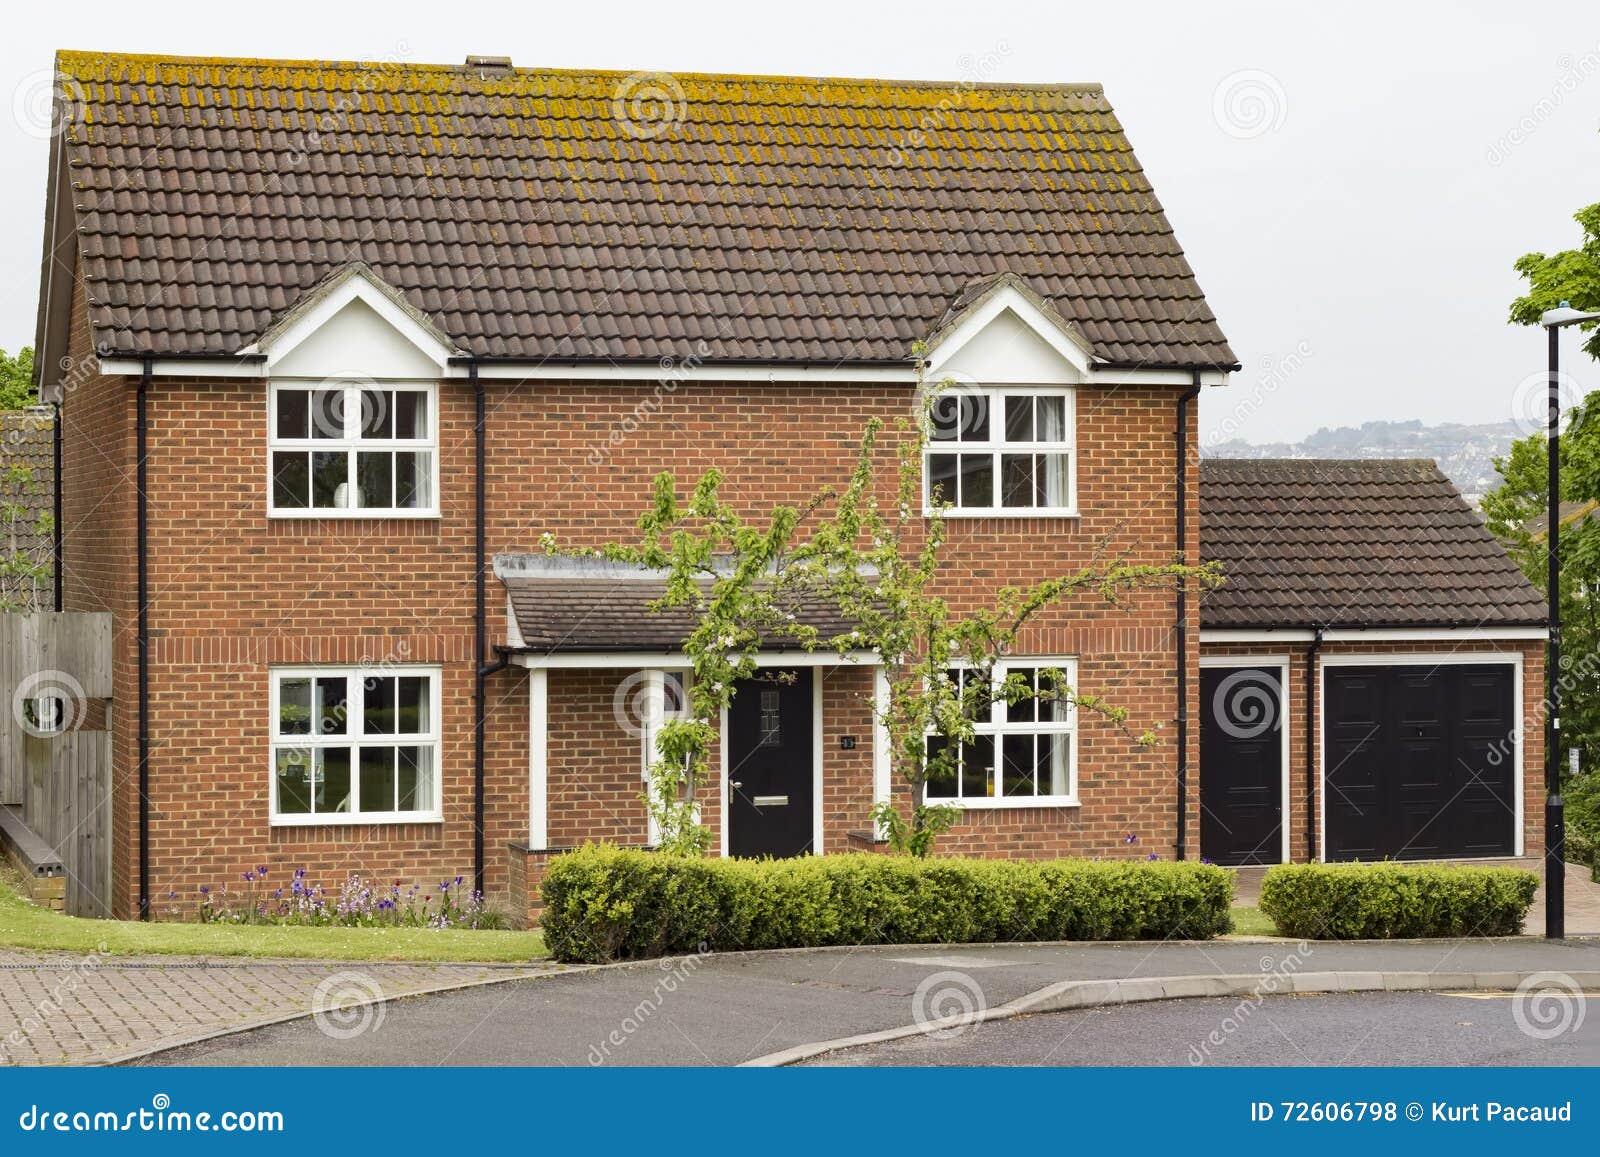 Typical British House Stock Photo Image 72606798